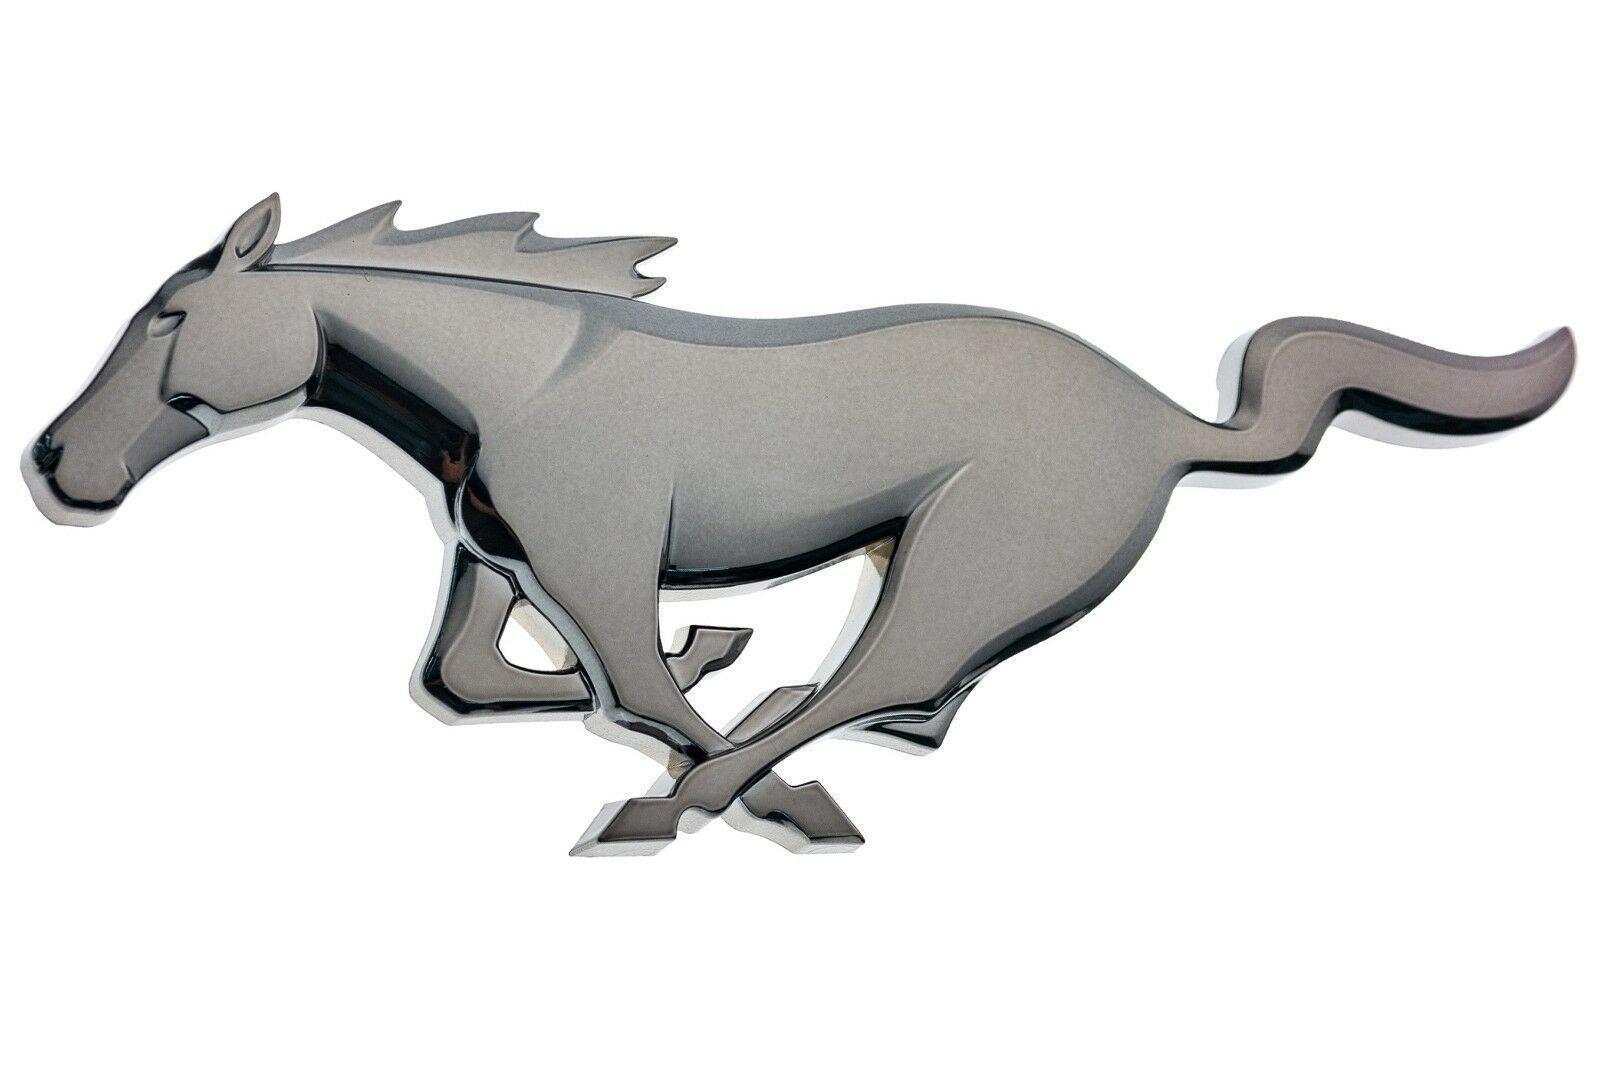 Google Image Result For Https M Media Amazon Com Images I 31zxs0v4ccl Sr500 500 Jpg Mustang Mustang Logo 2014 Ford Mustang